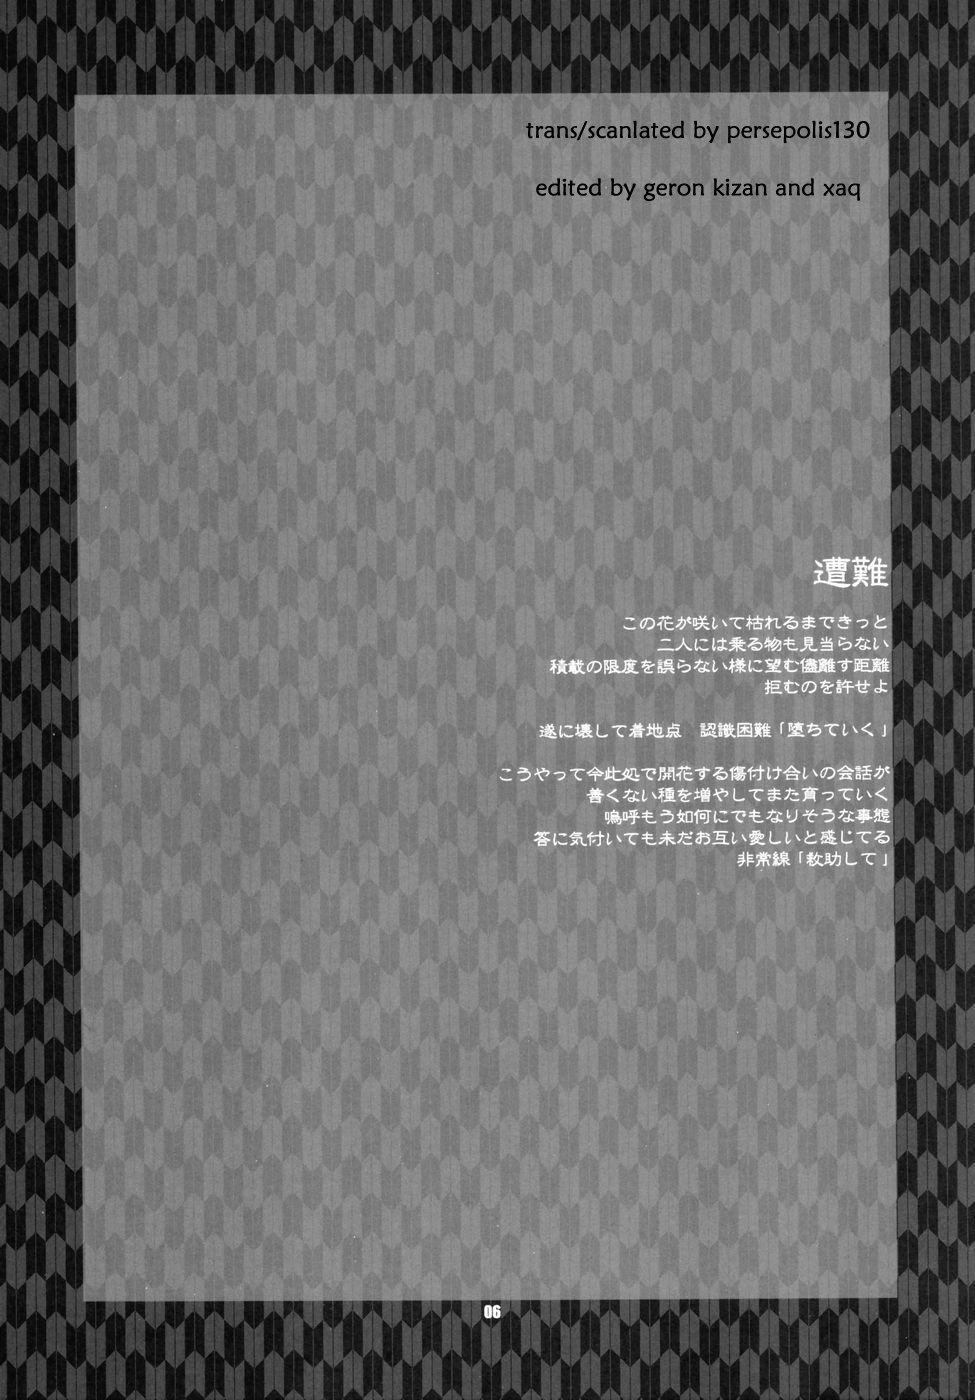 Himitsu - The Secret 6